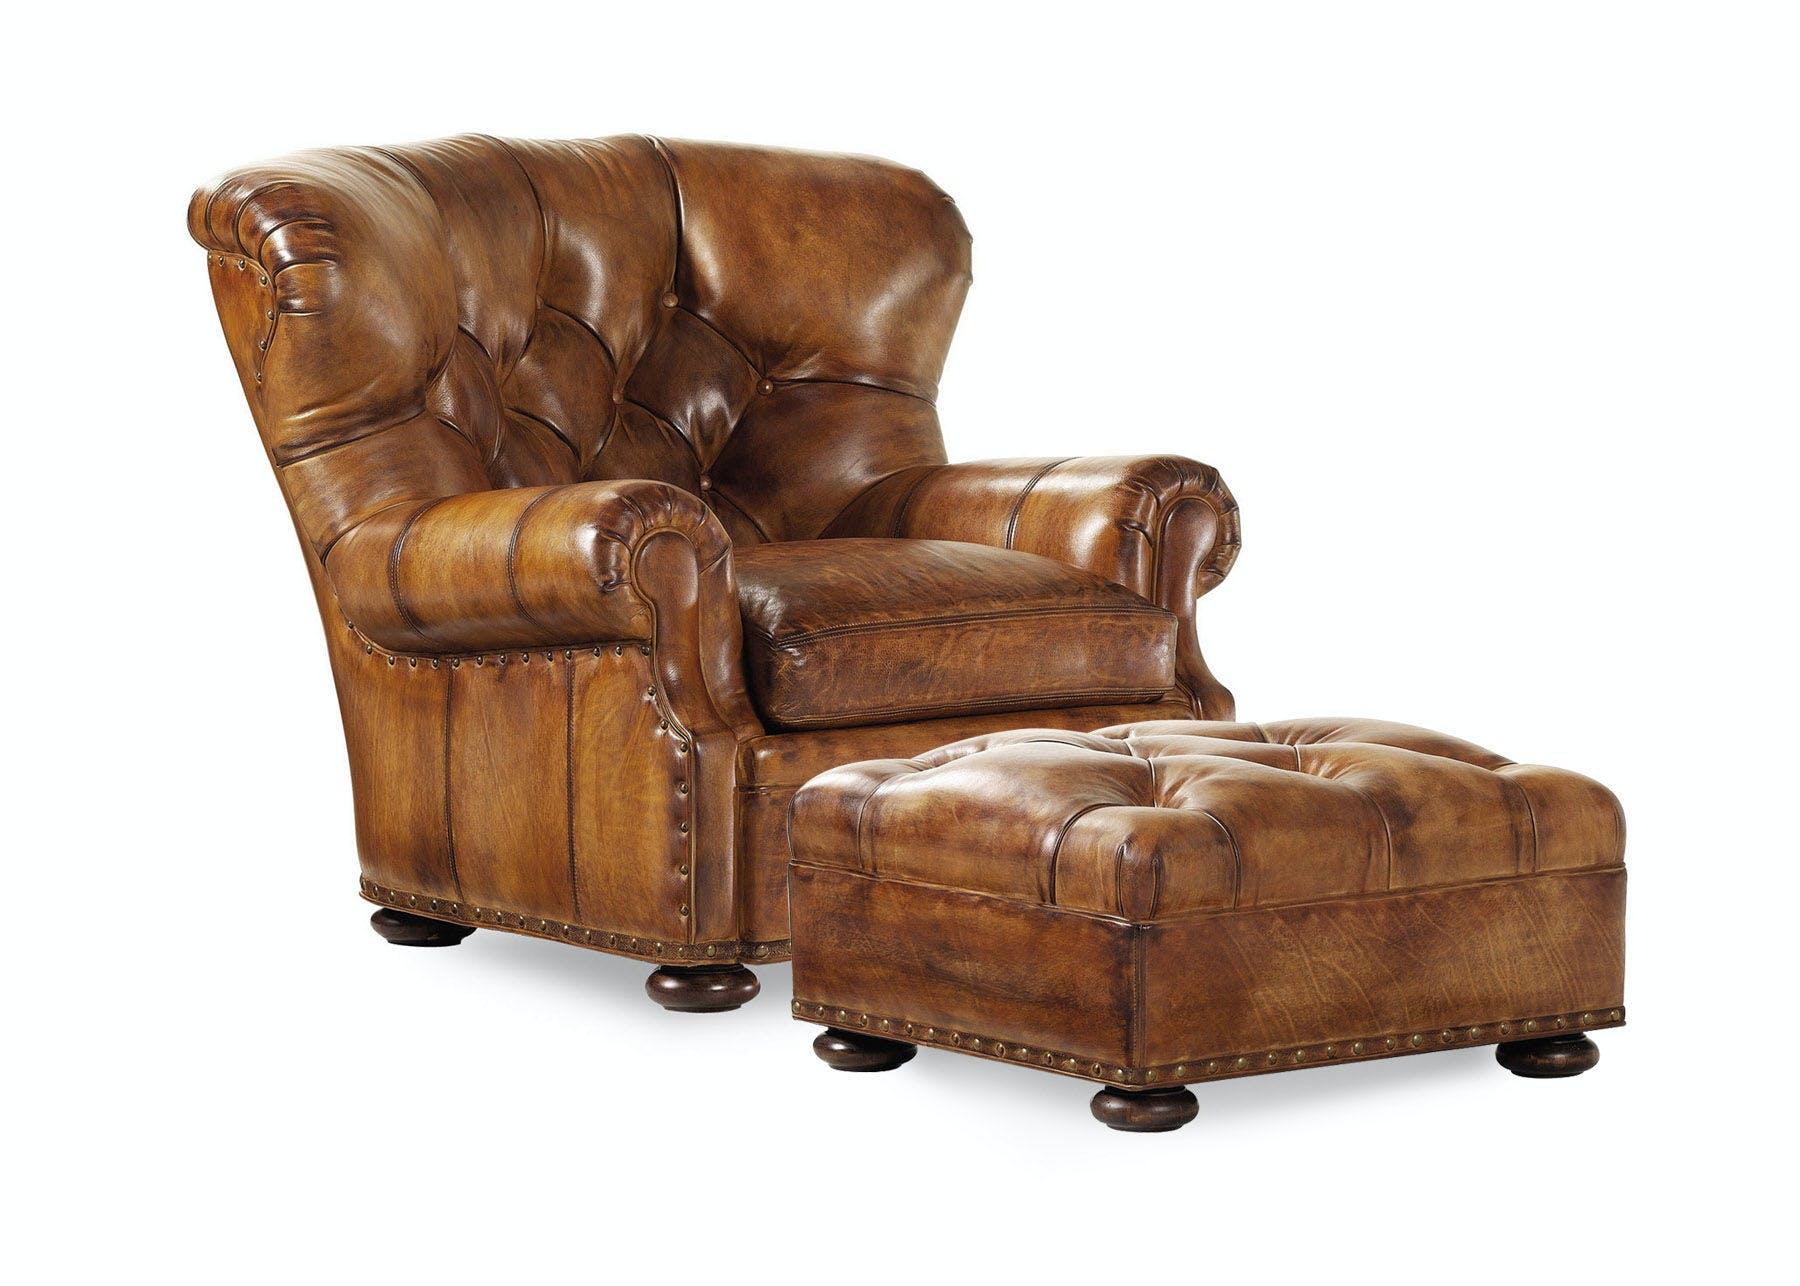 Hancock And Moore Living Room Chair And Ottoman Han4690 Walter E Smithe Furniture Design